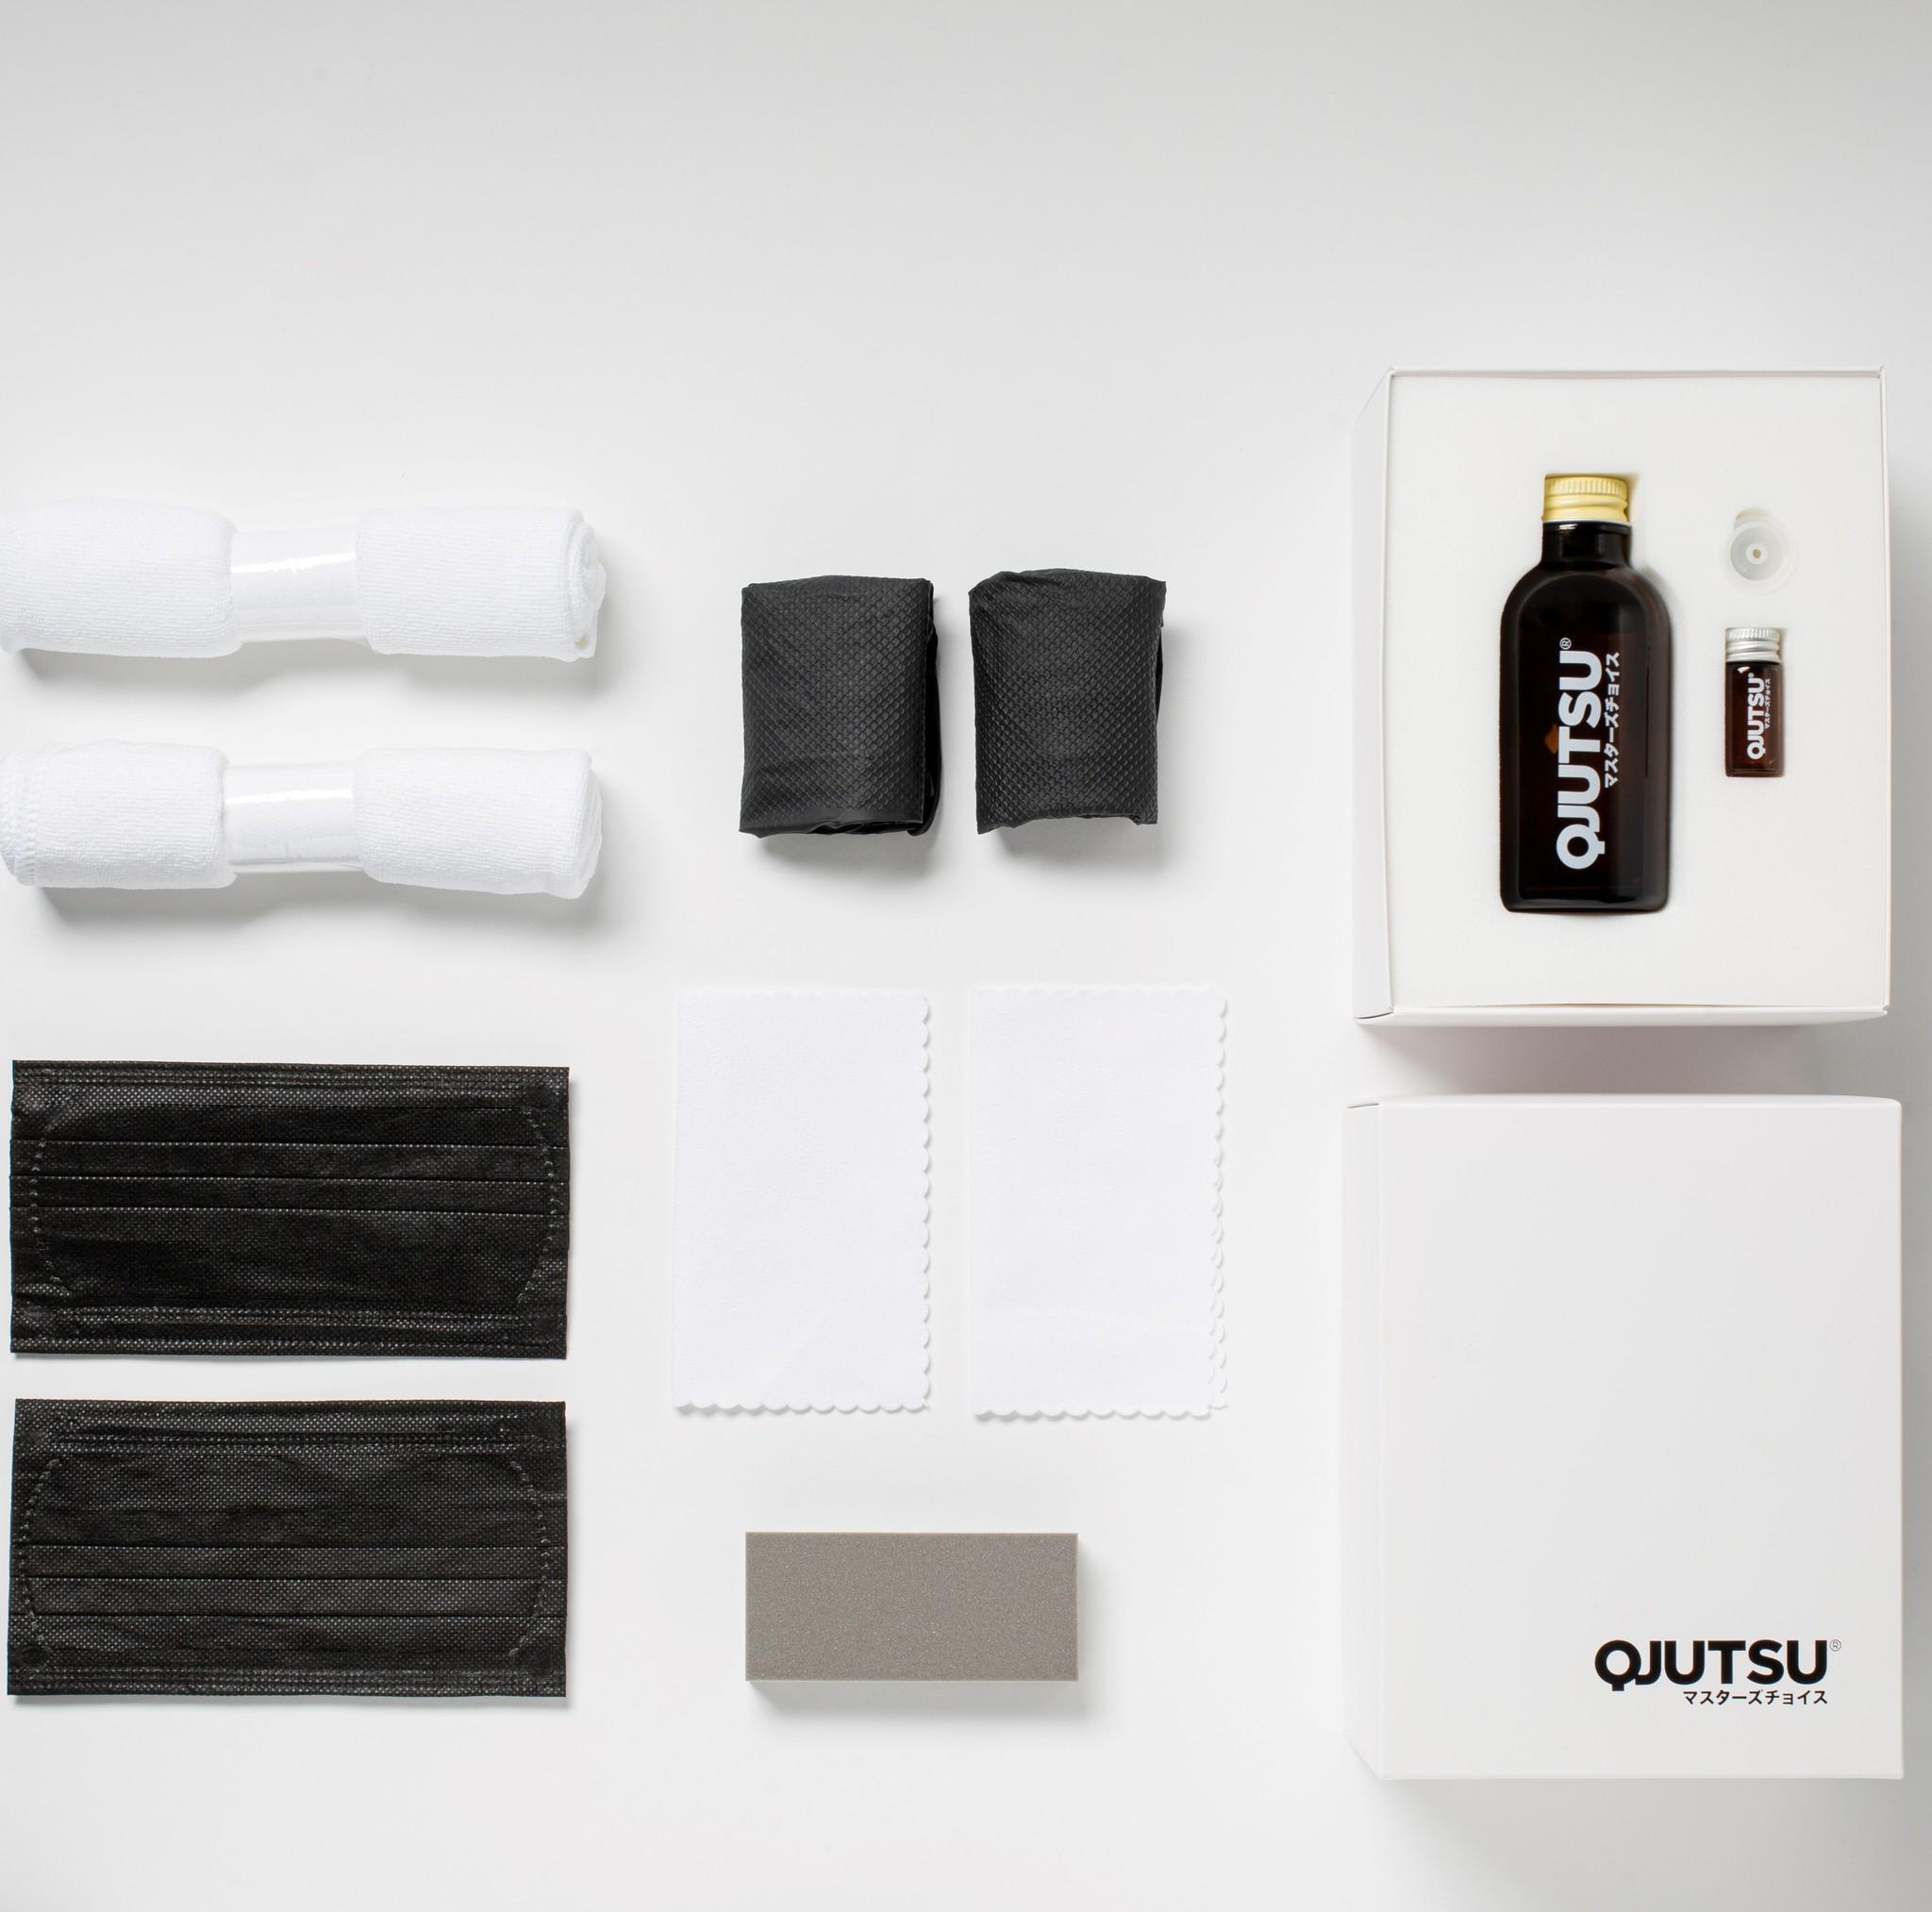 Soft99 Soft99 QJUTSU Body Coat Pro 100ml